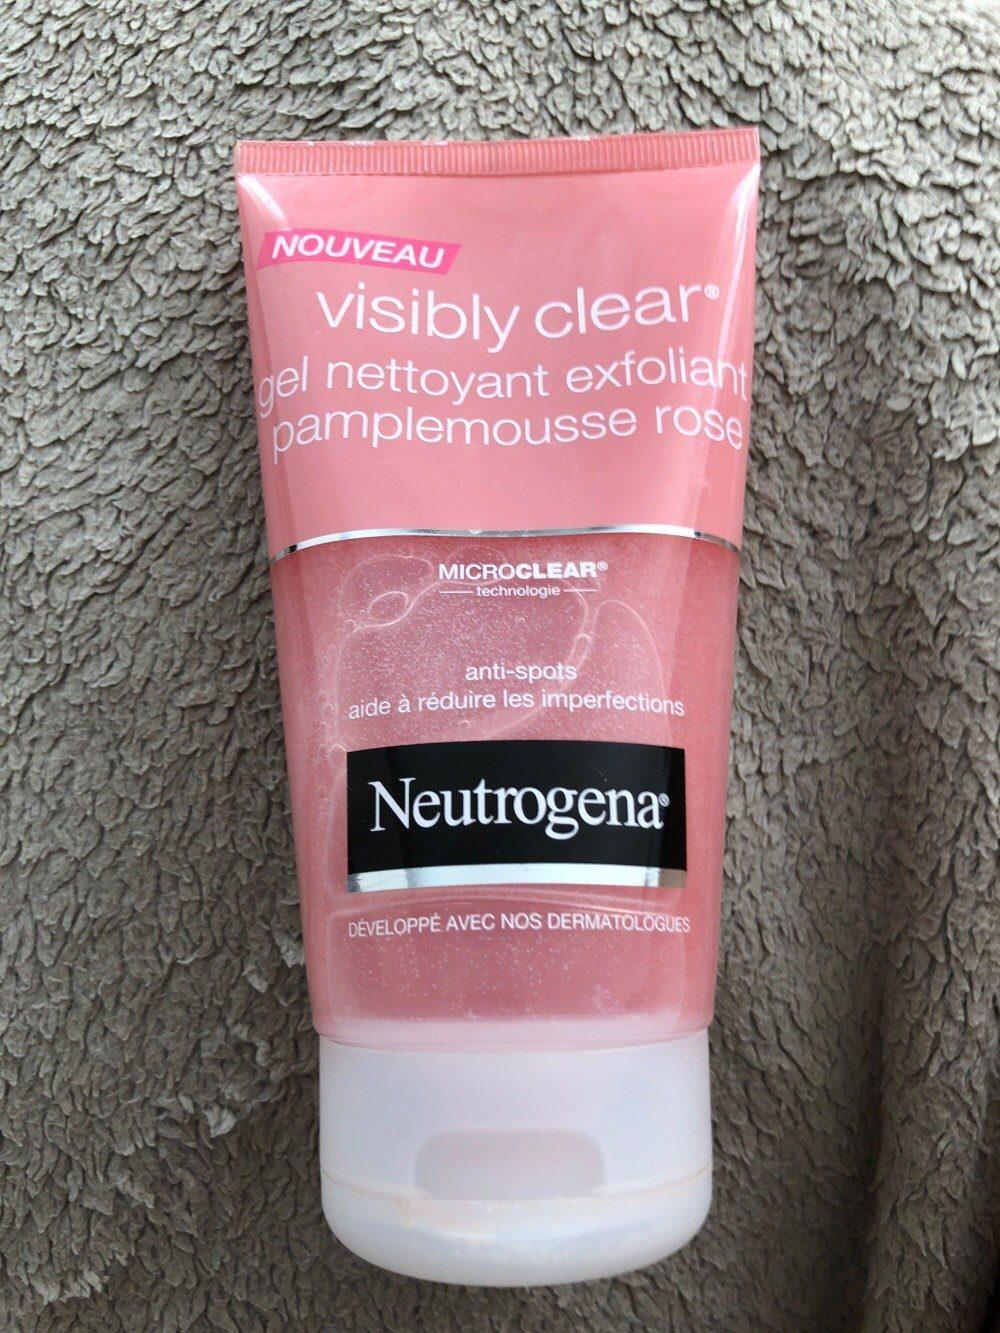 gel nettoyant exfoliant neutrogena - Produit - fr